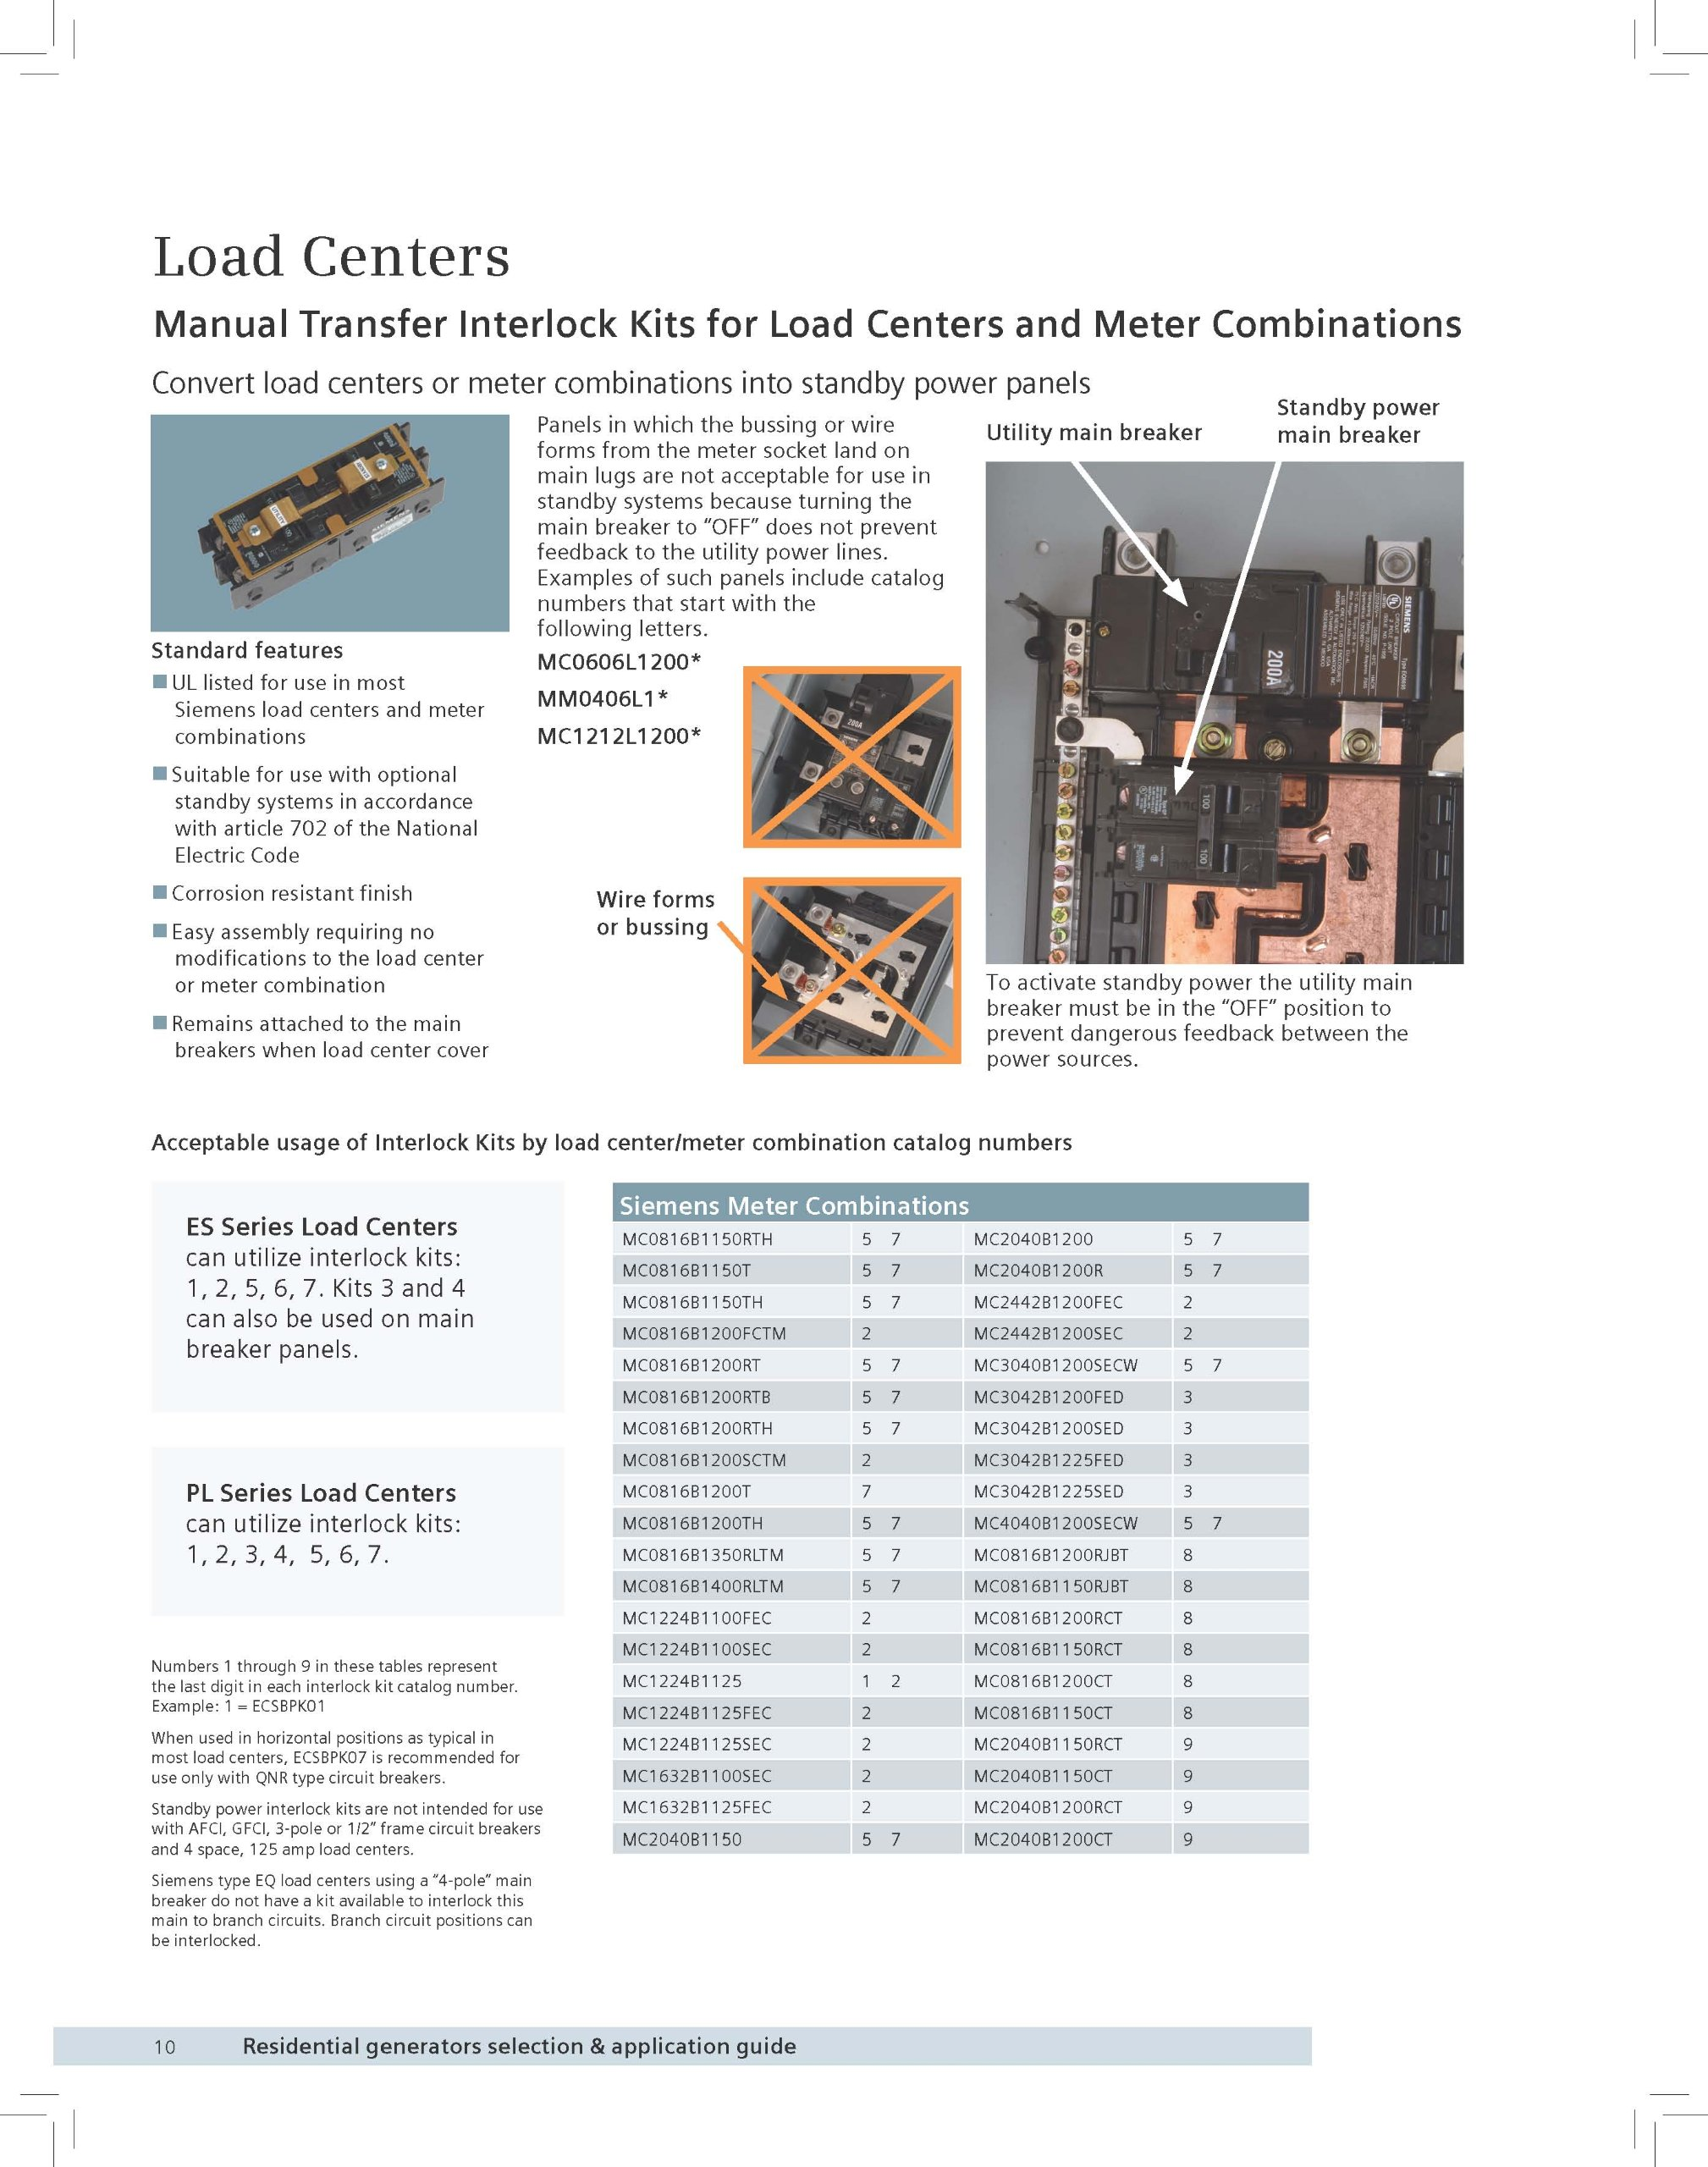 Siemens ECSBPK03 Generator Standby Power Mechanical Interlock by Siemens (Image #2)